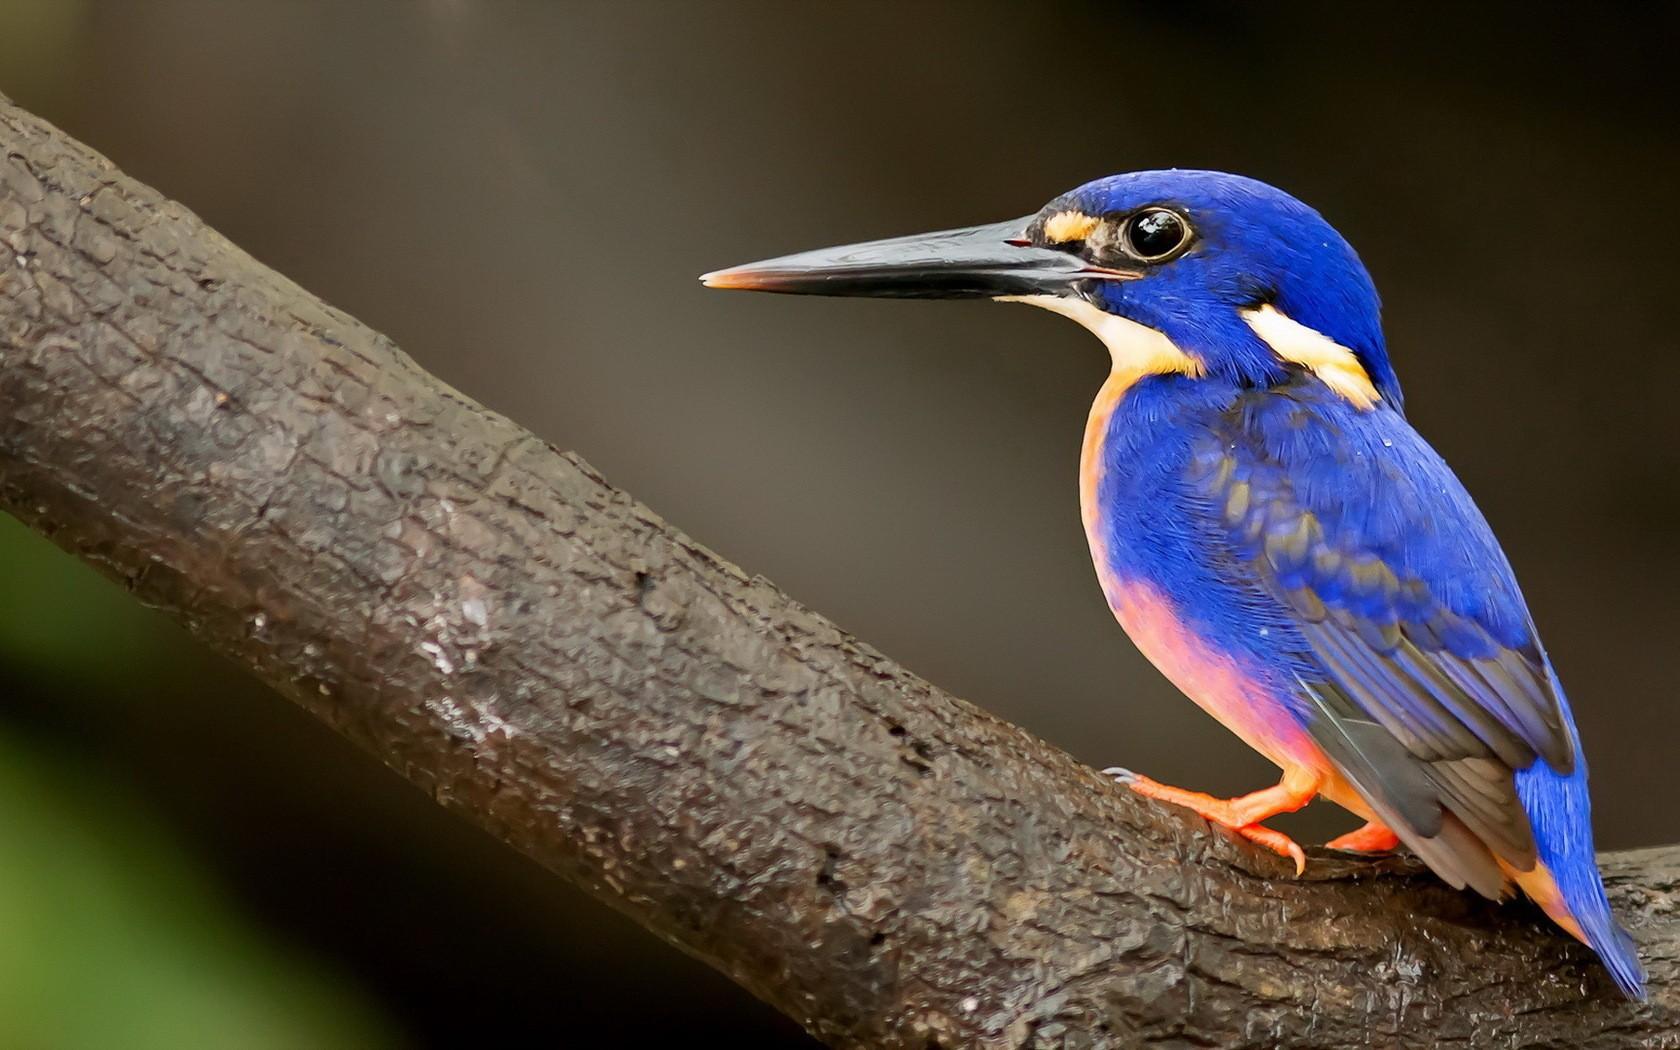 General 1680x1050 animals birds kingfisher